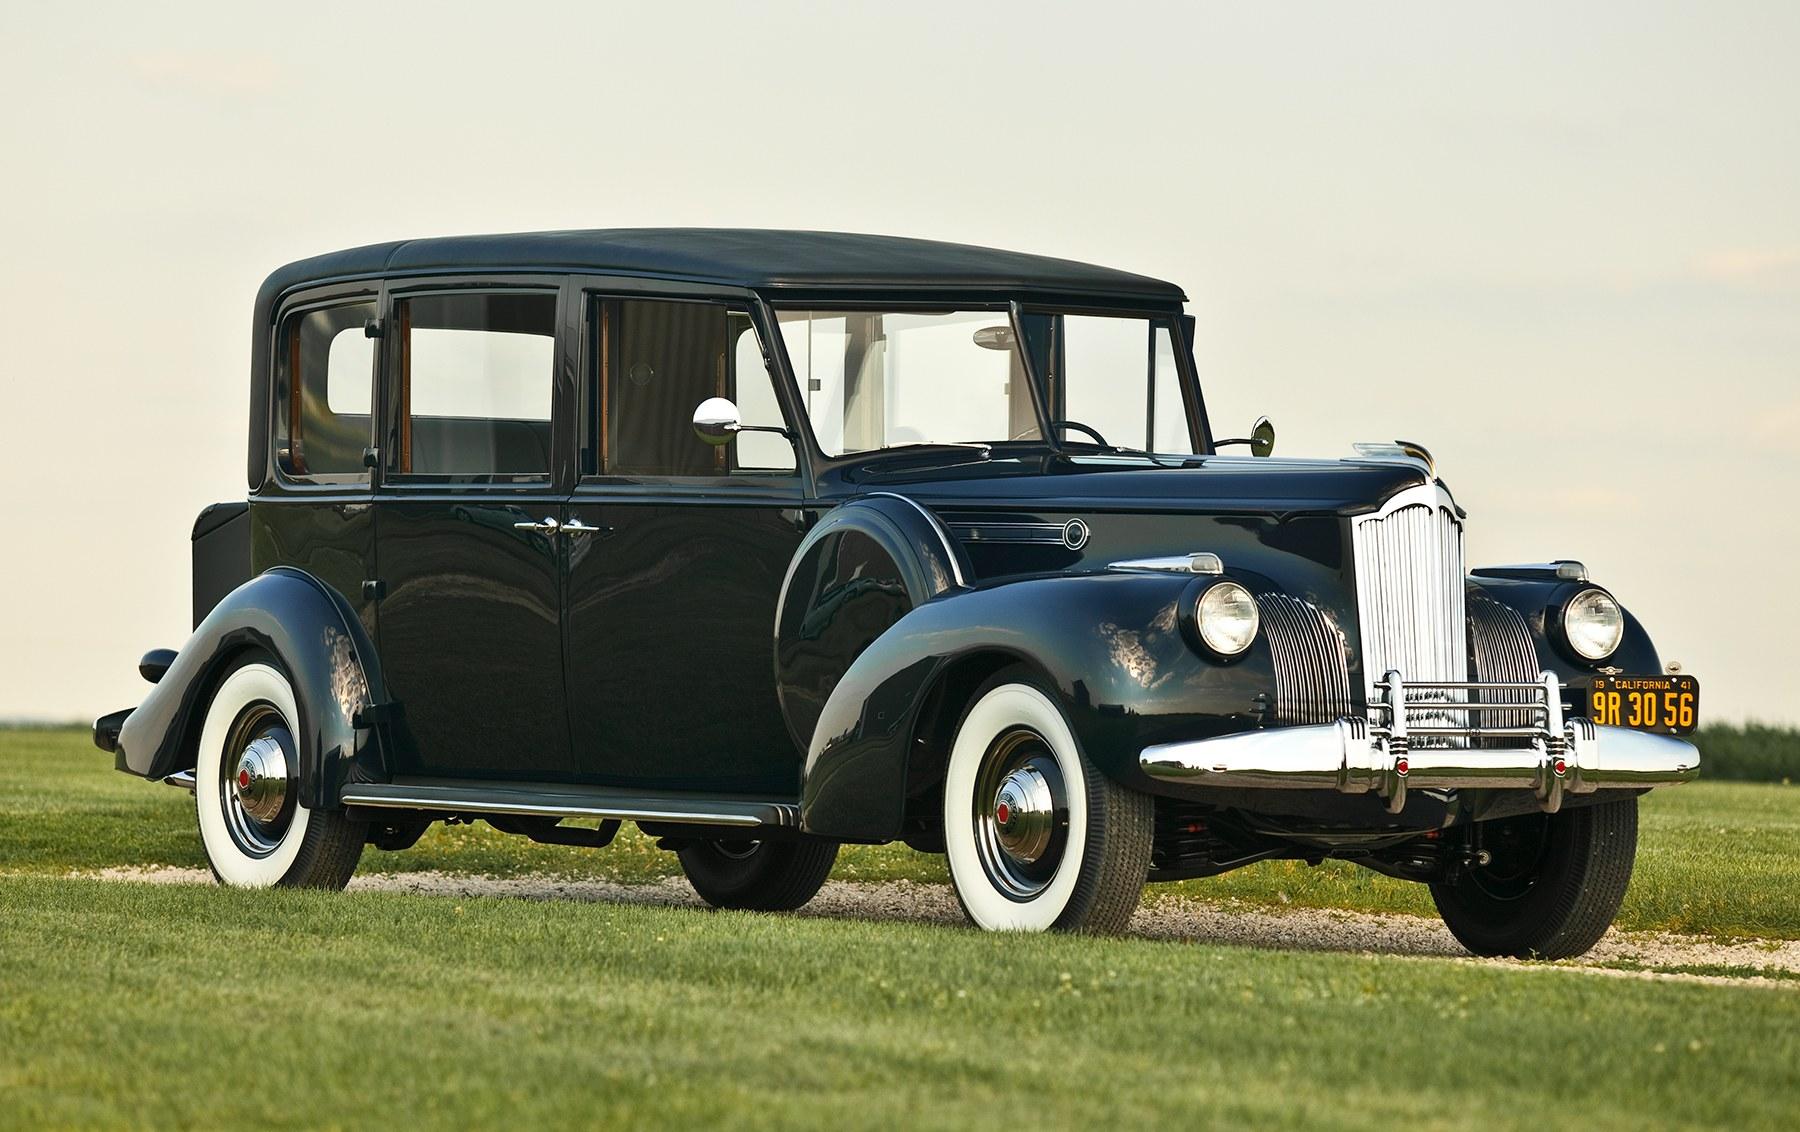 1941 Packard Model 1905 Super-8 160 Limousine